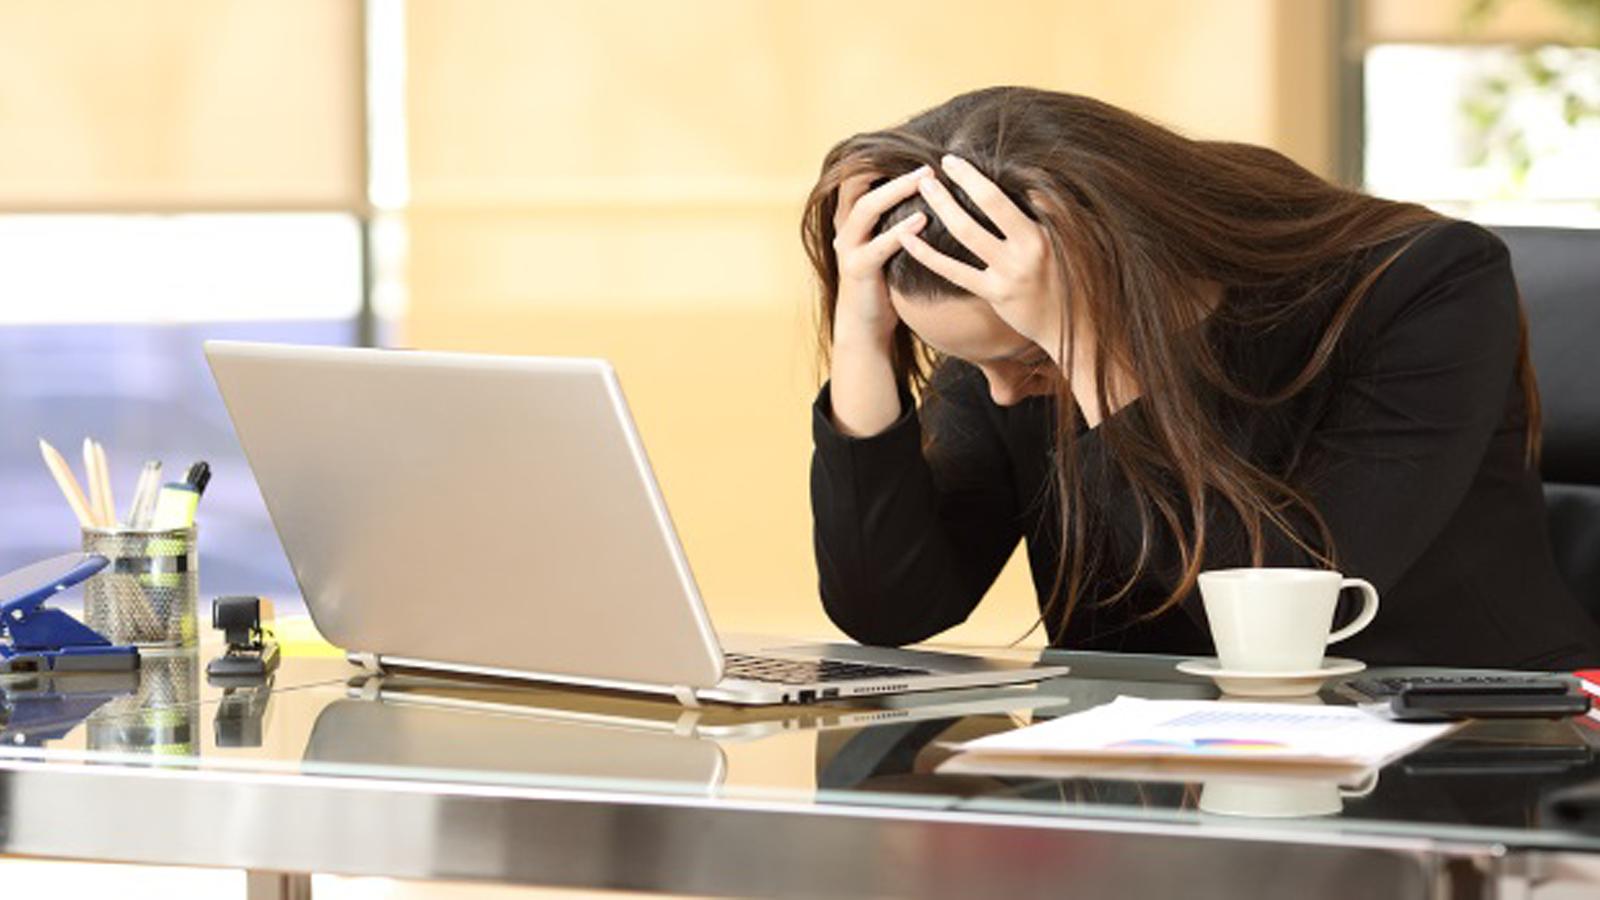 Kάλυψη πανδημίας: Η εξάρτηση των ΜΜΕ από έναν βασικό πελάτη αυξάνει τη ζήτηση